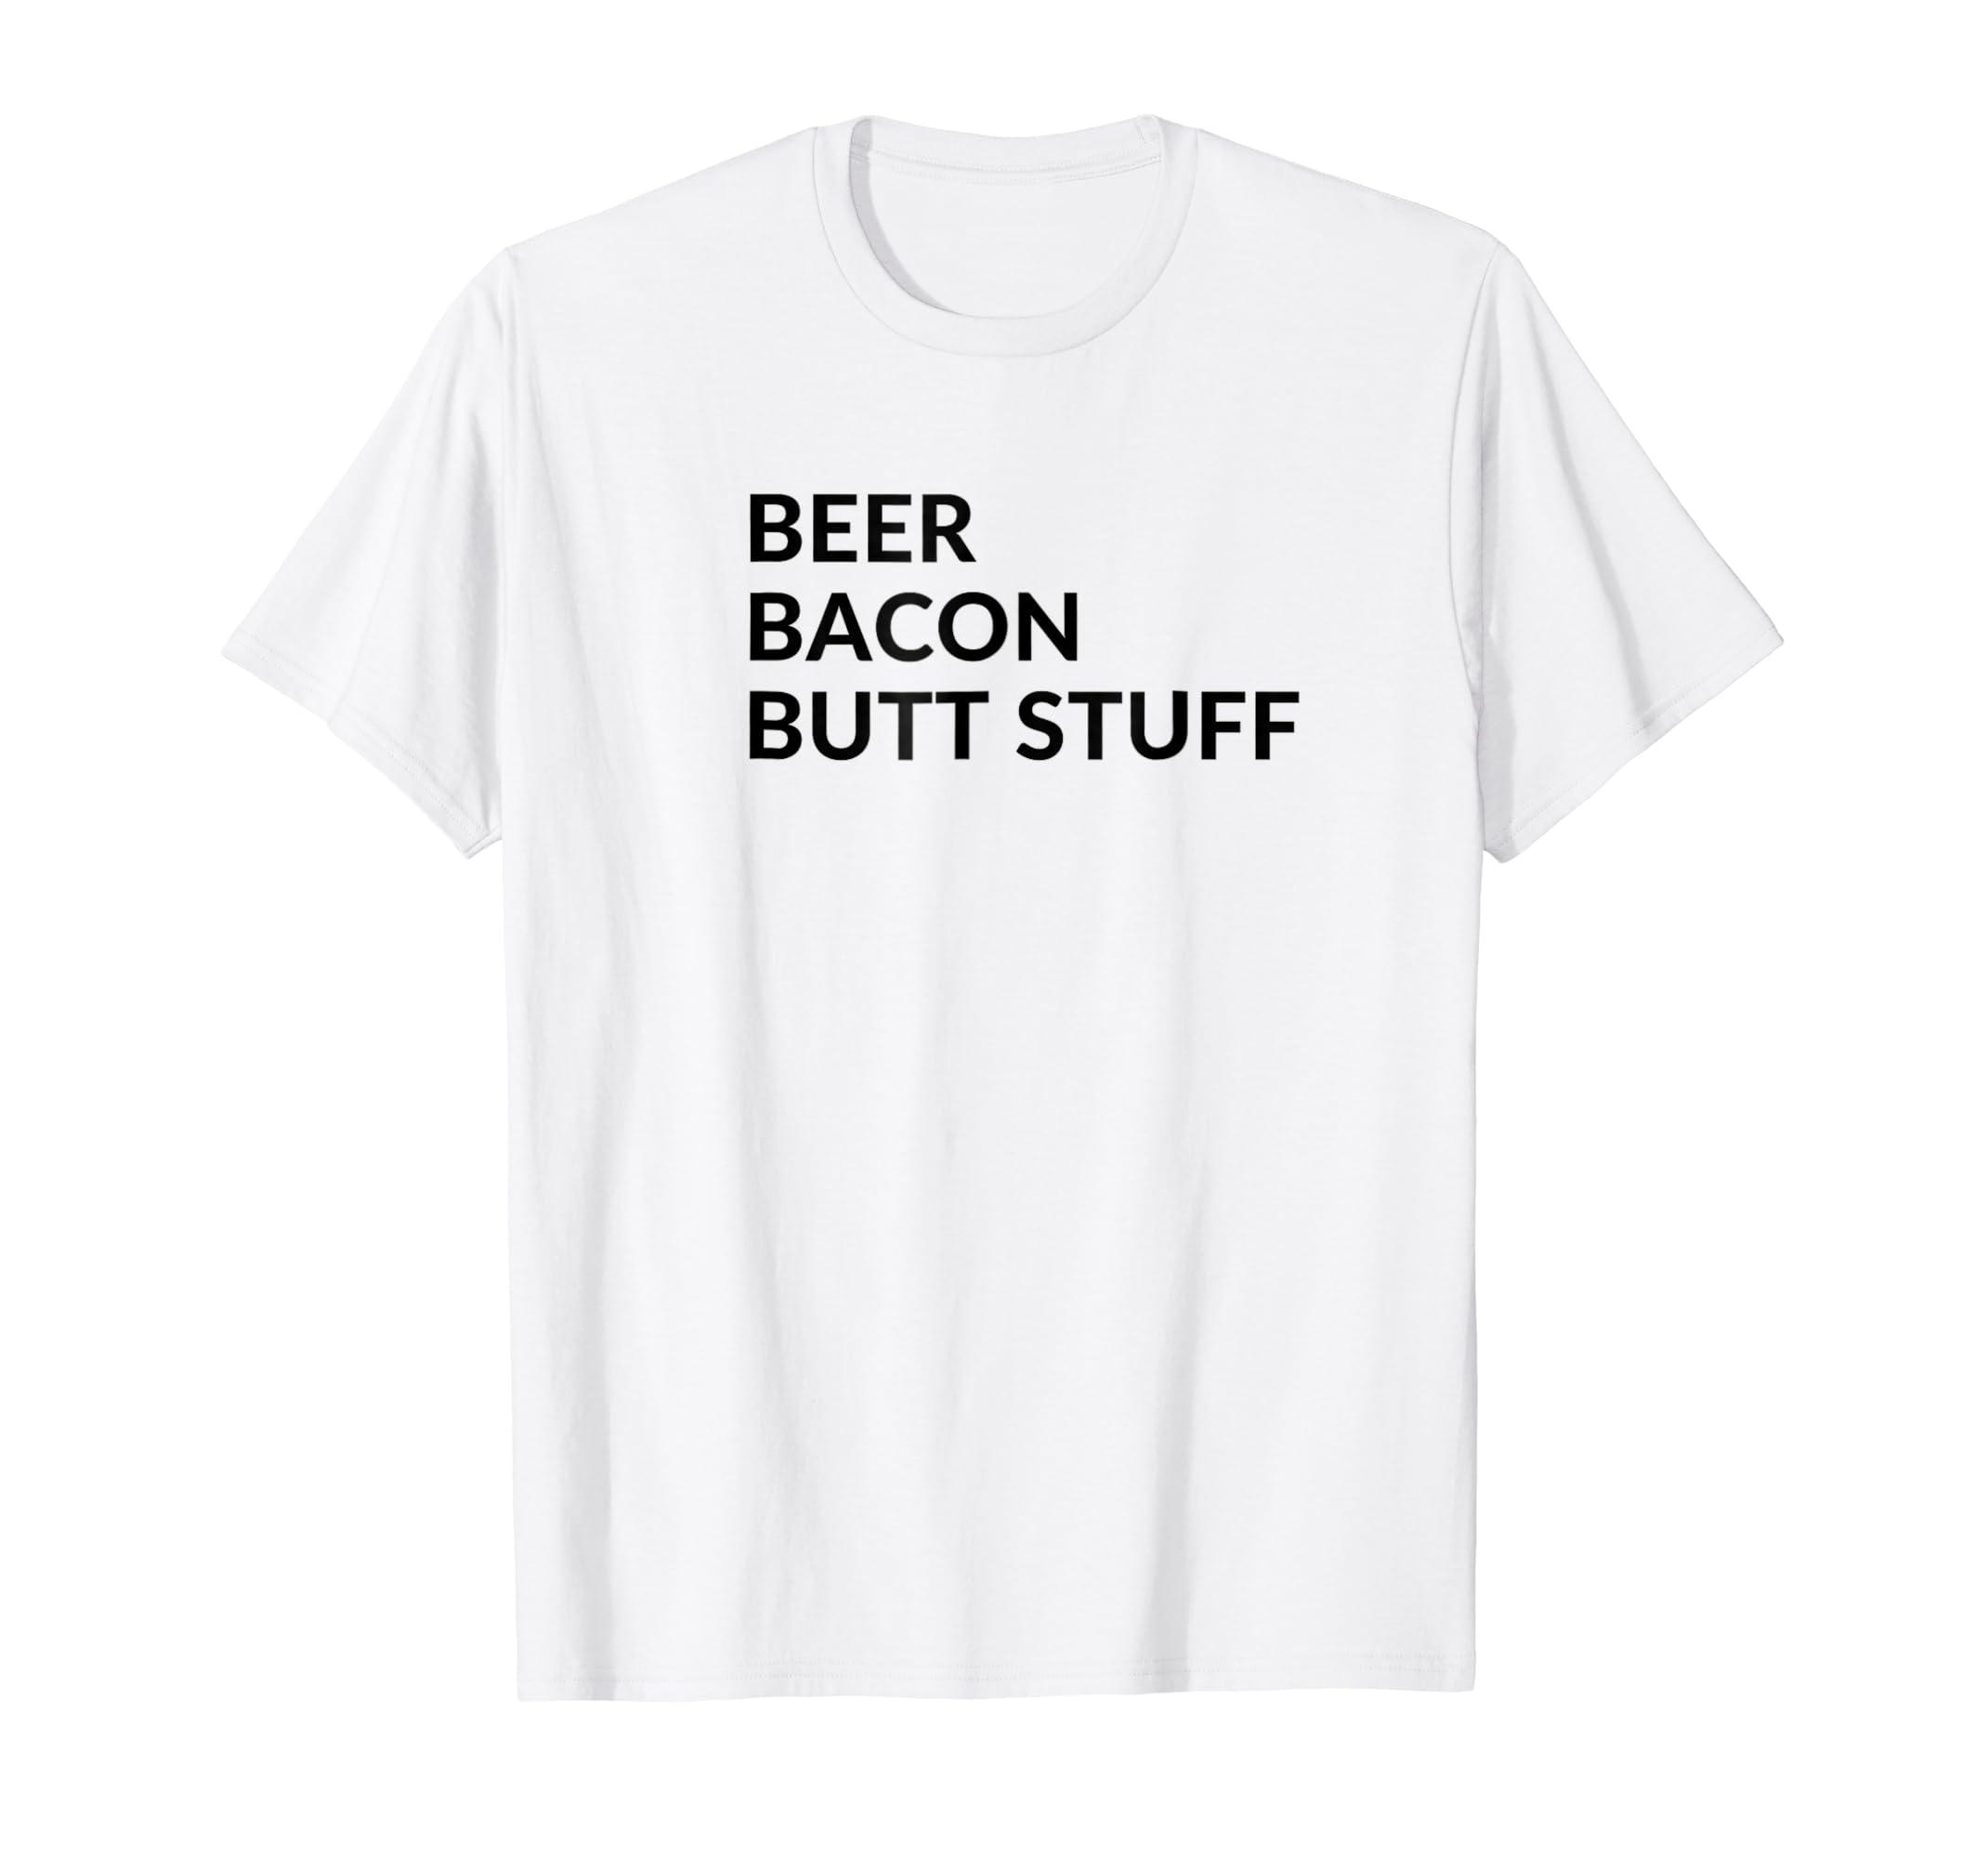 Beer Bacon Butt Stuff Funny T-Shirt-AZP